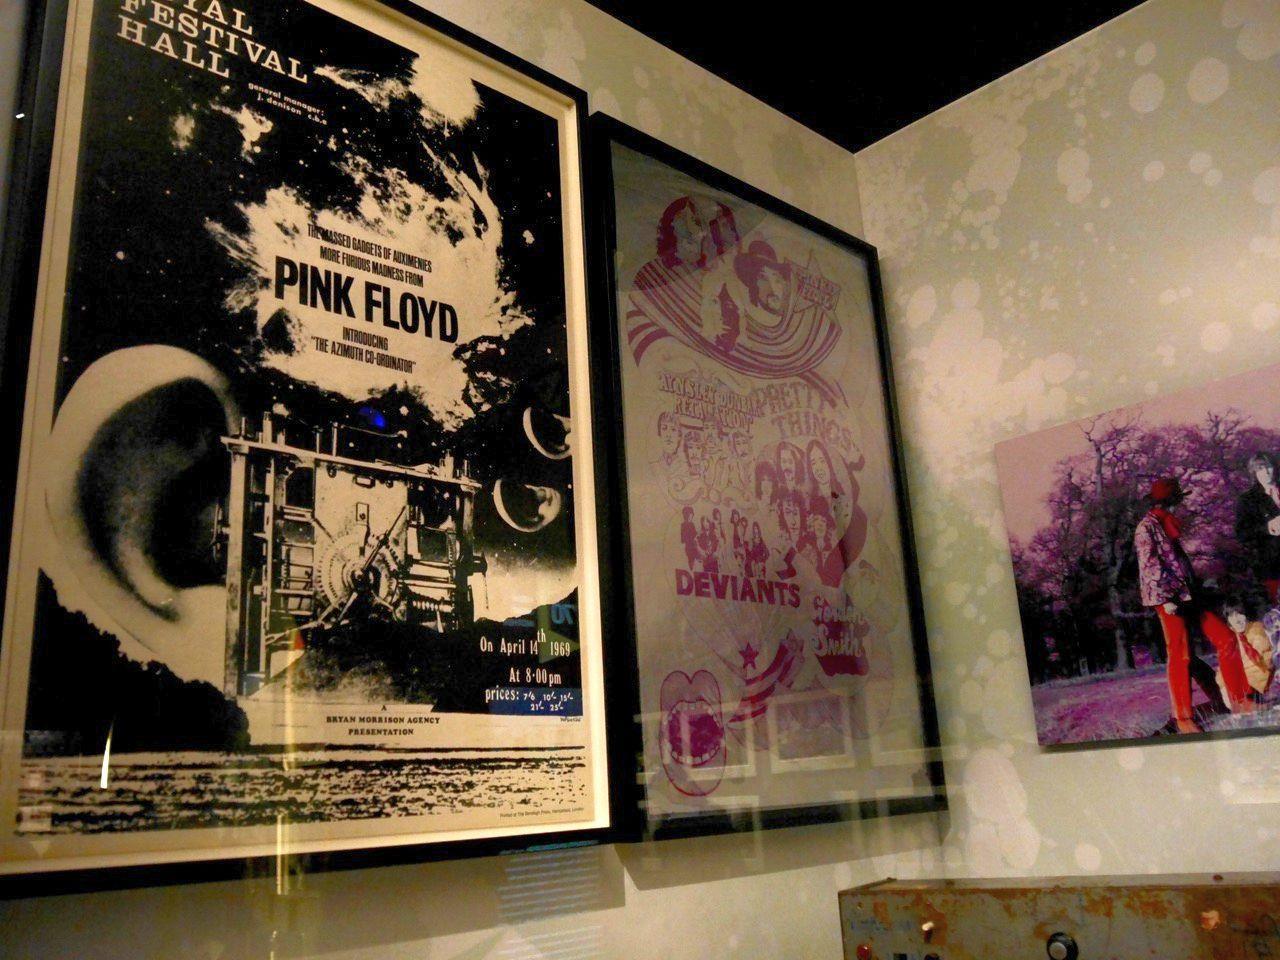 Una foto della mostra